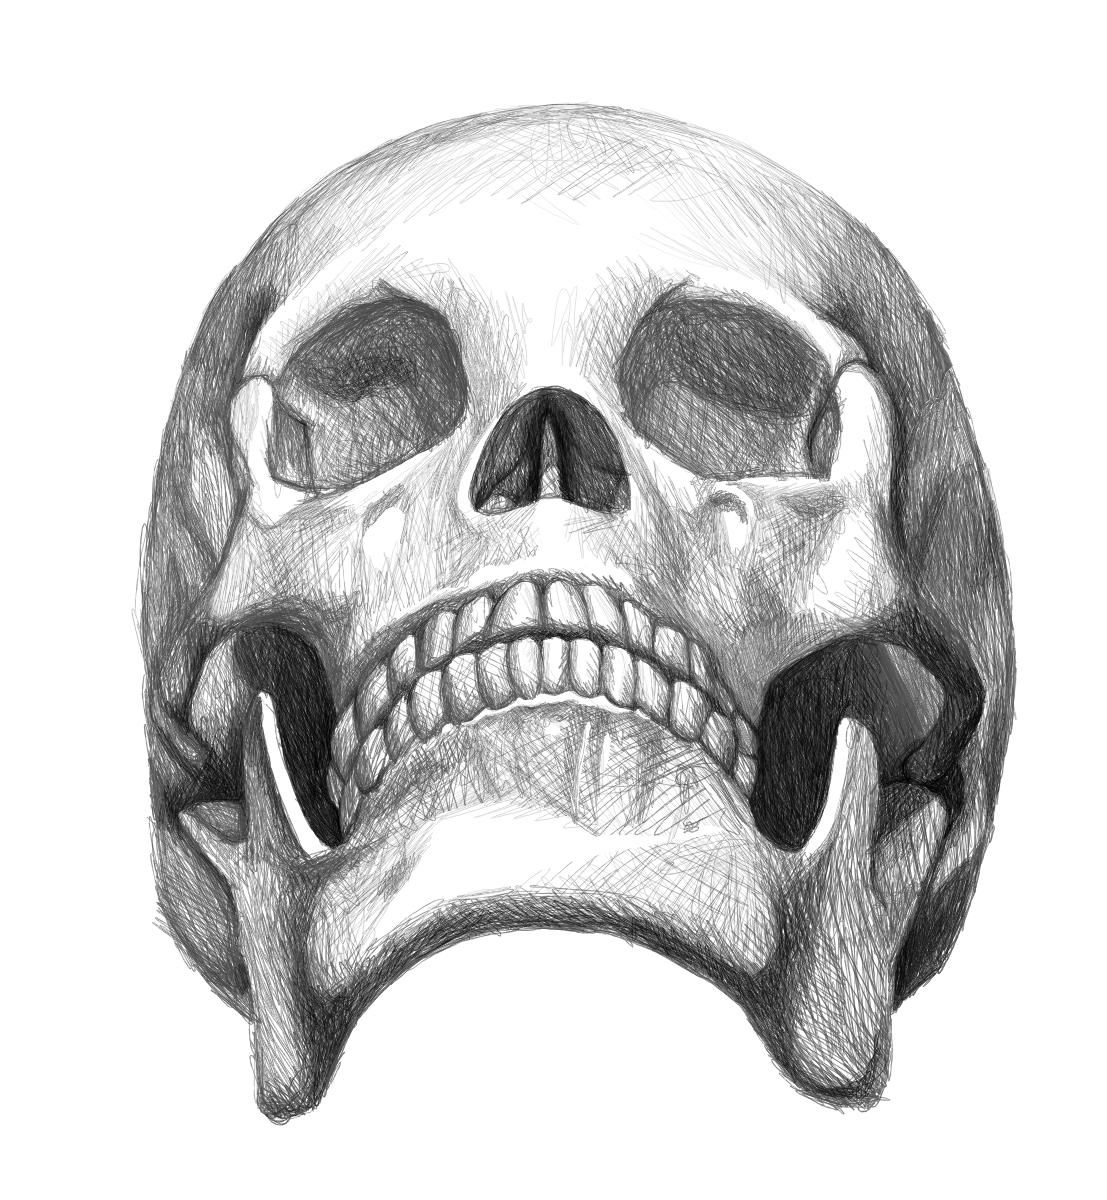 Skull by m3ru